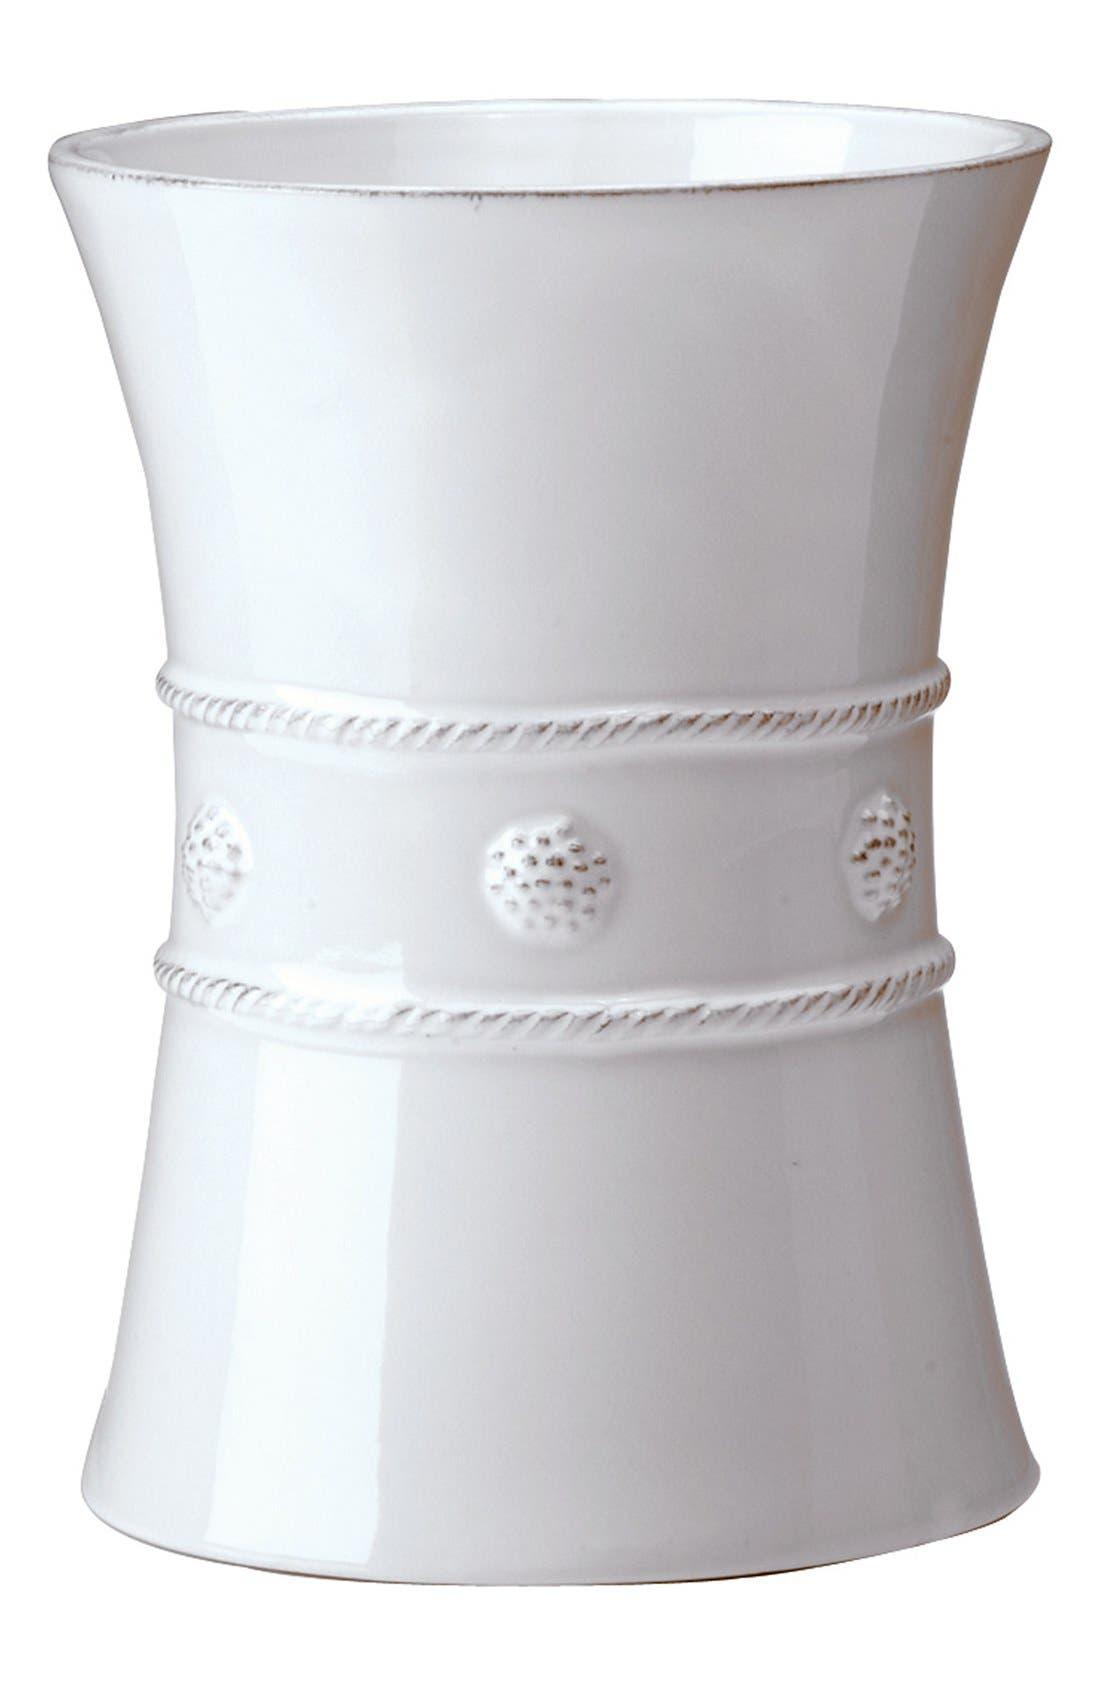 'Berry and Thread' Ceramic Utensil Crock,                             Main thumbnail 1, color,                             Whitewash